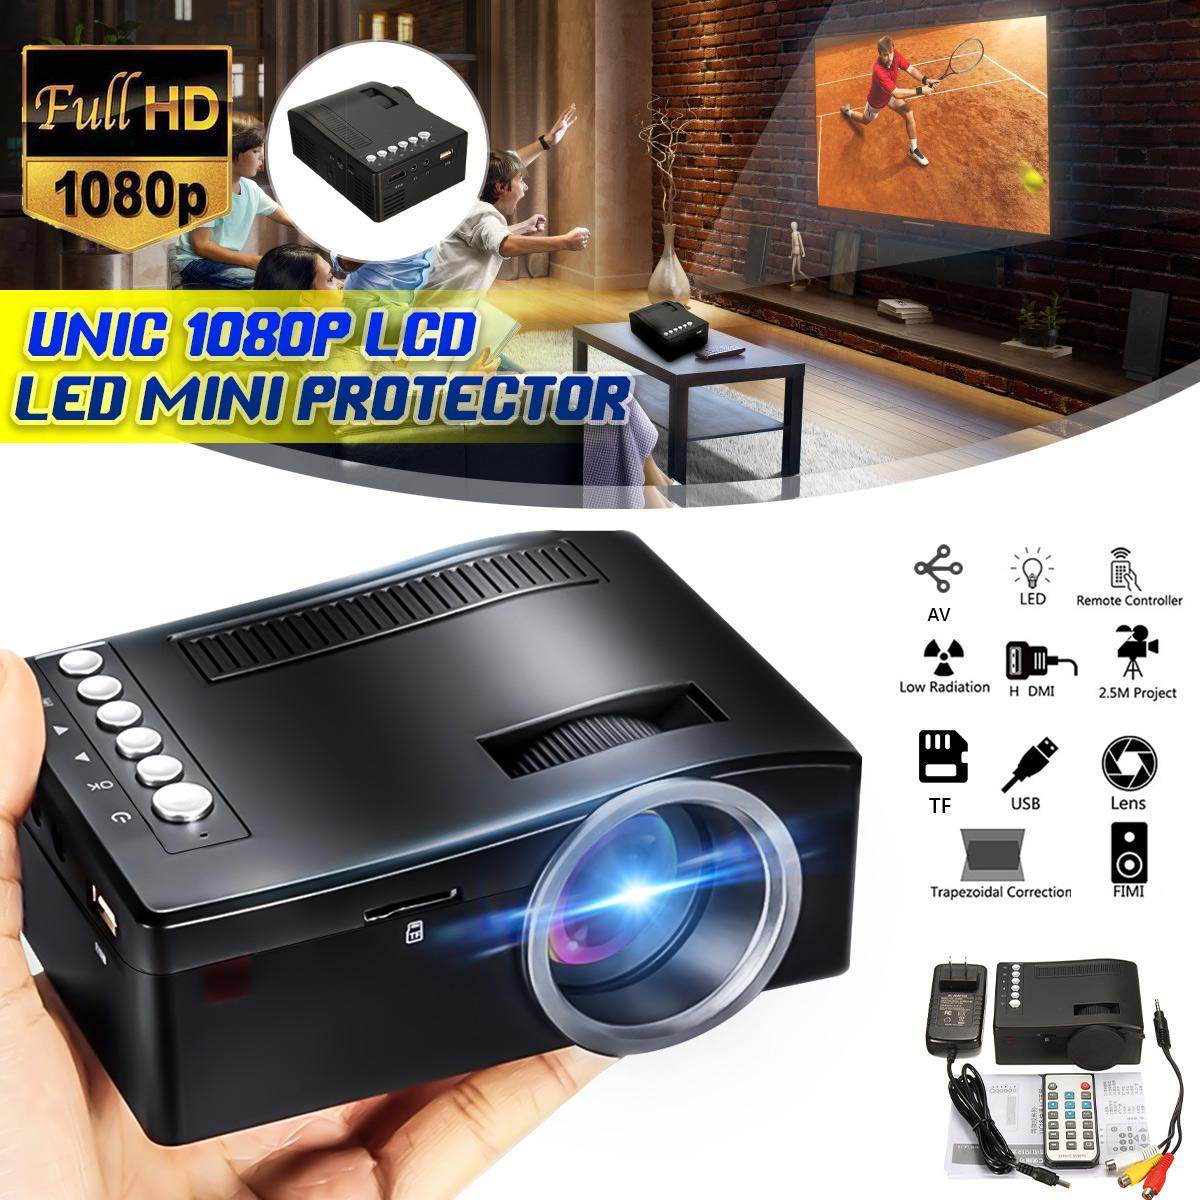 Mini LED Projector Home Cinema Theater HD Multimedia Player Support TV AV/USB/TF/MMC/HDMI FM Radio